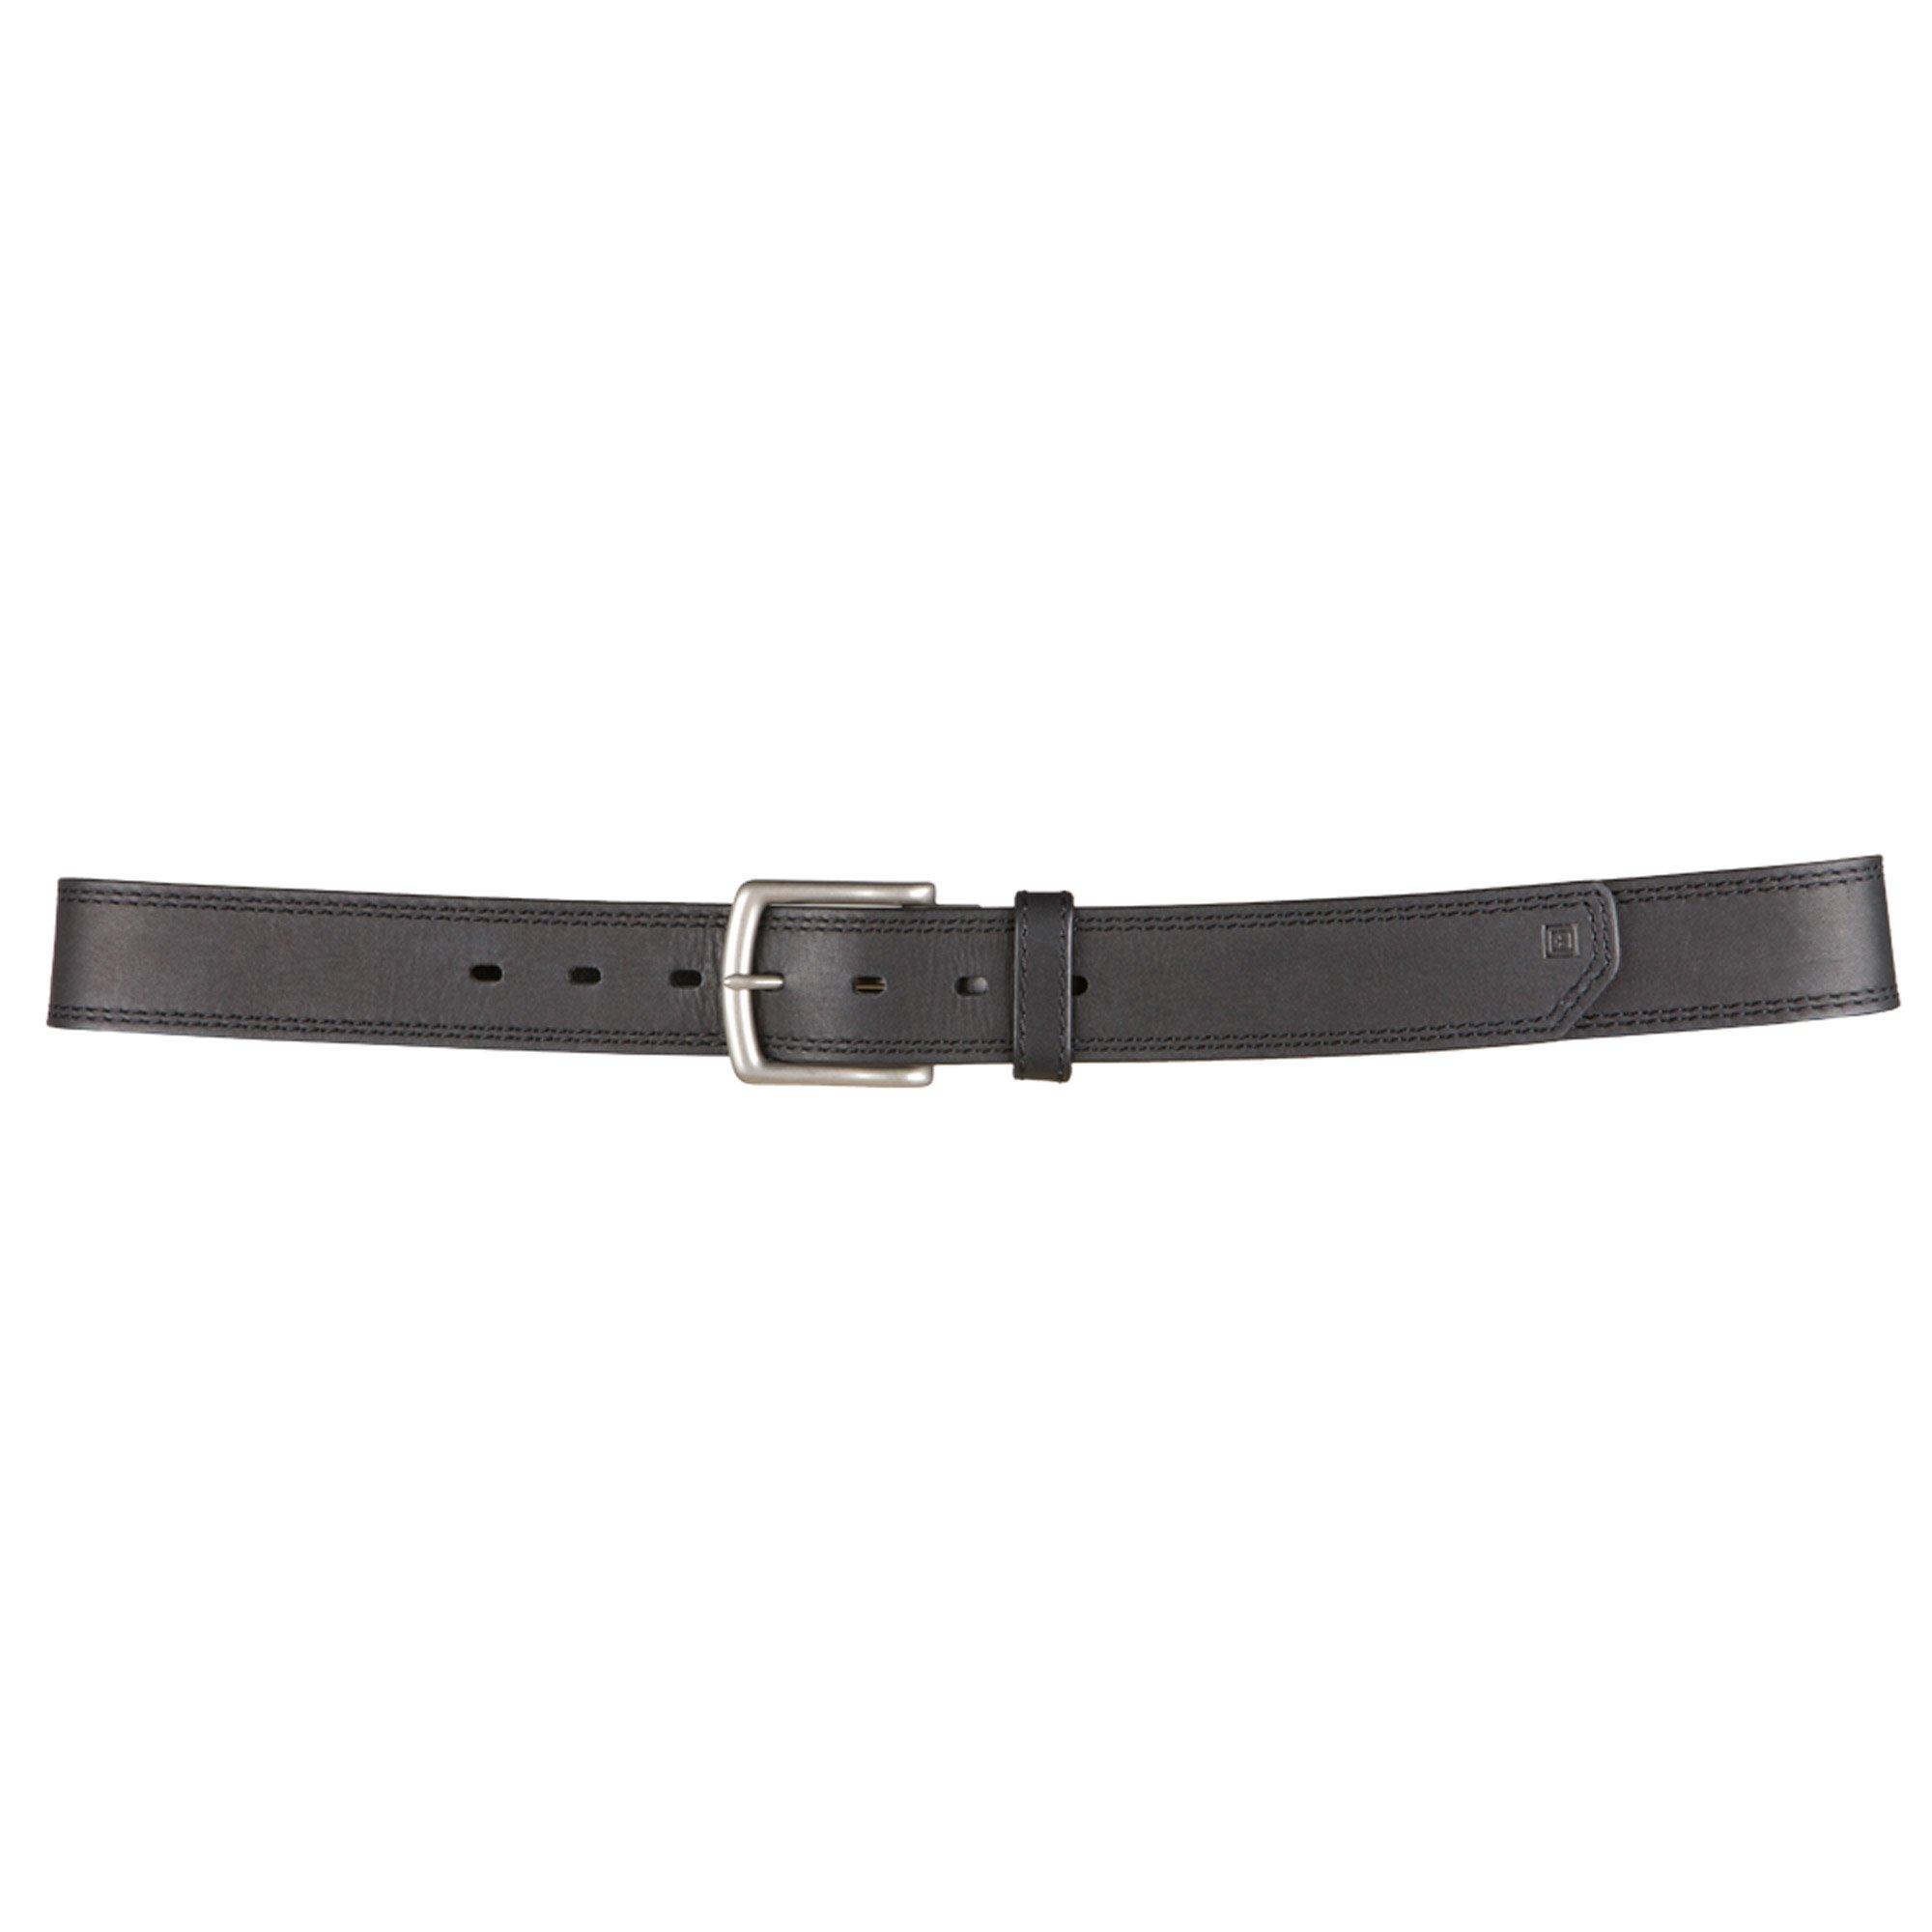 5.11 Tactical Arc Leather Belt, Black, Large